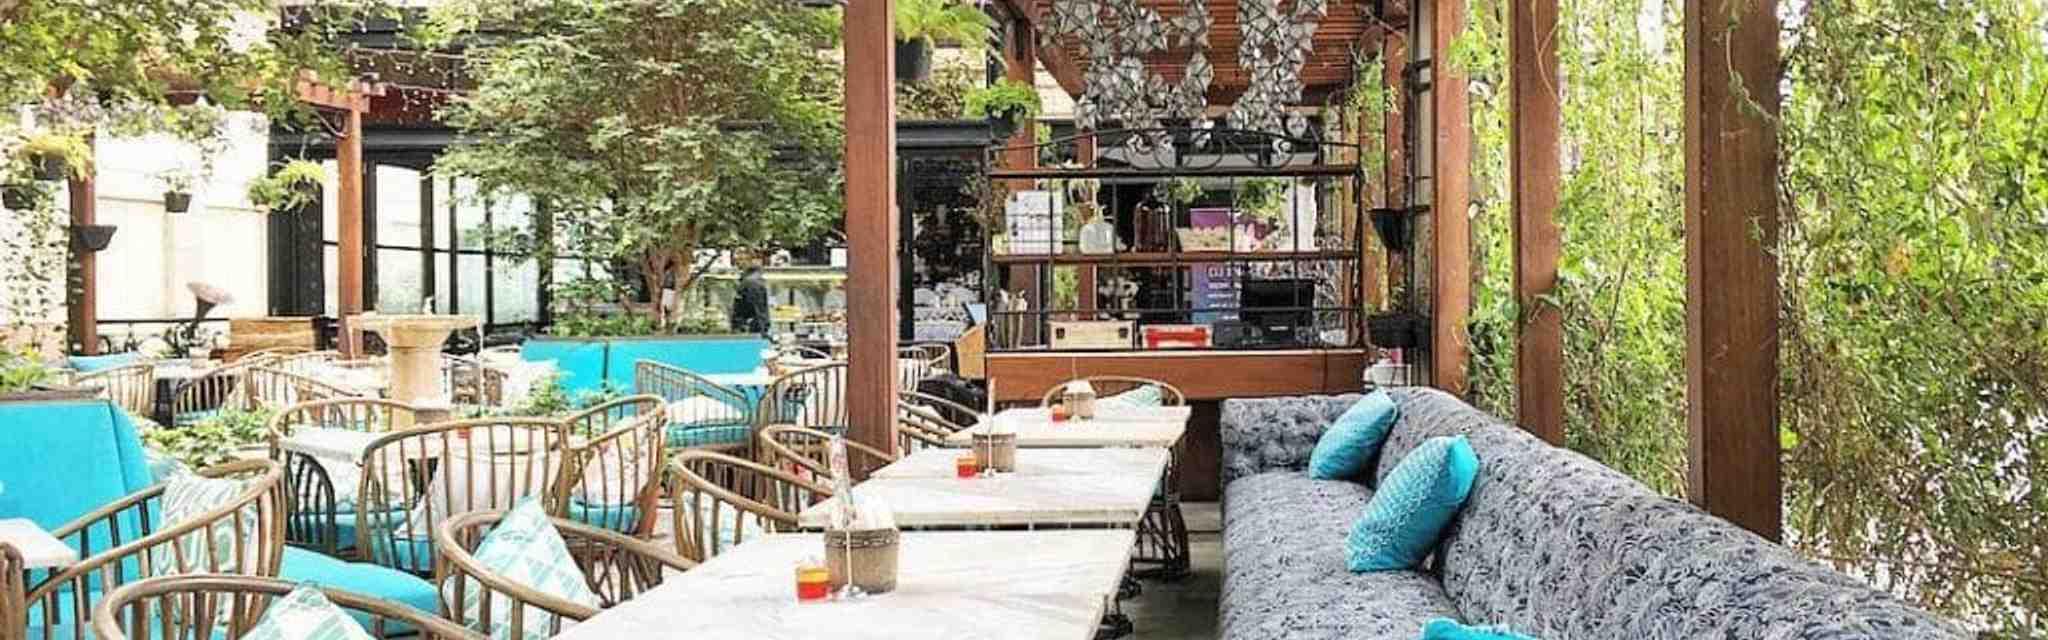 10 Cafe Unik Di Jakarta Ini Bikin Kamu Betah Nongkrong